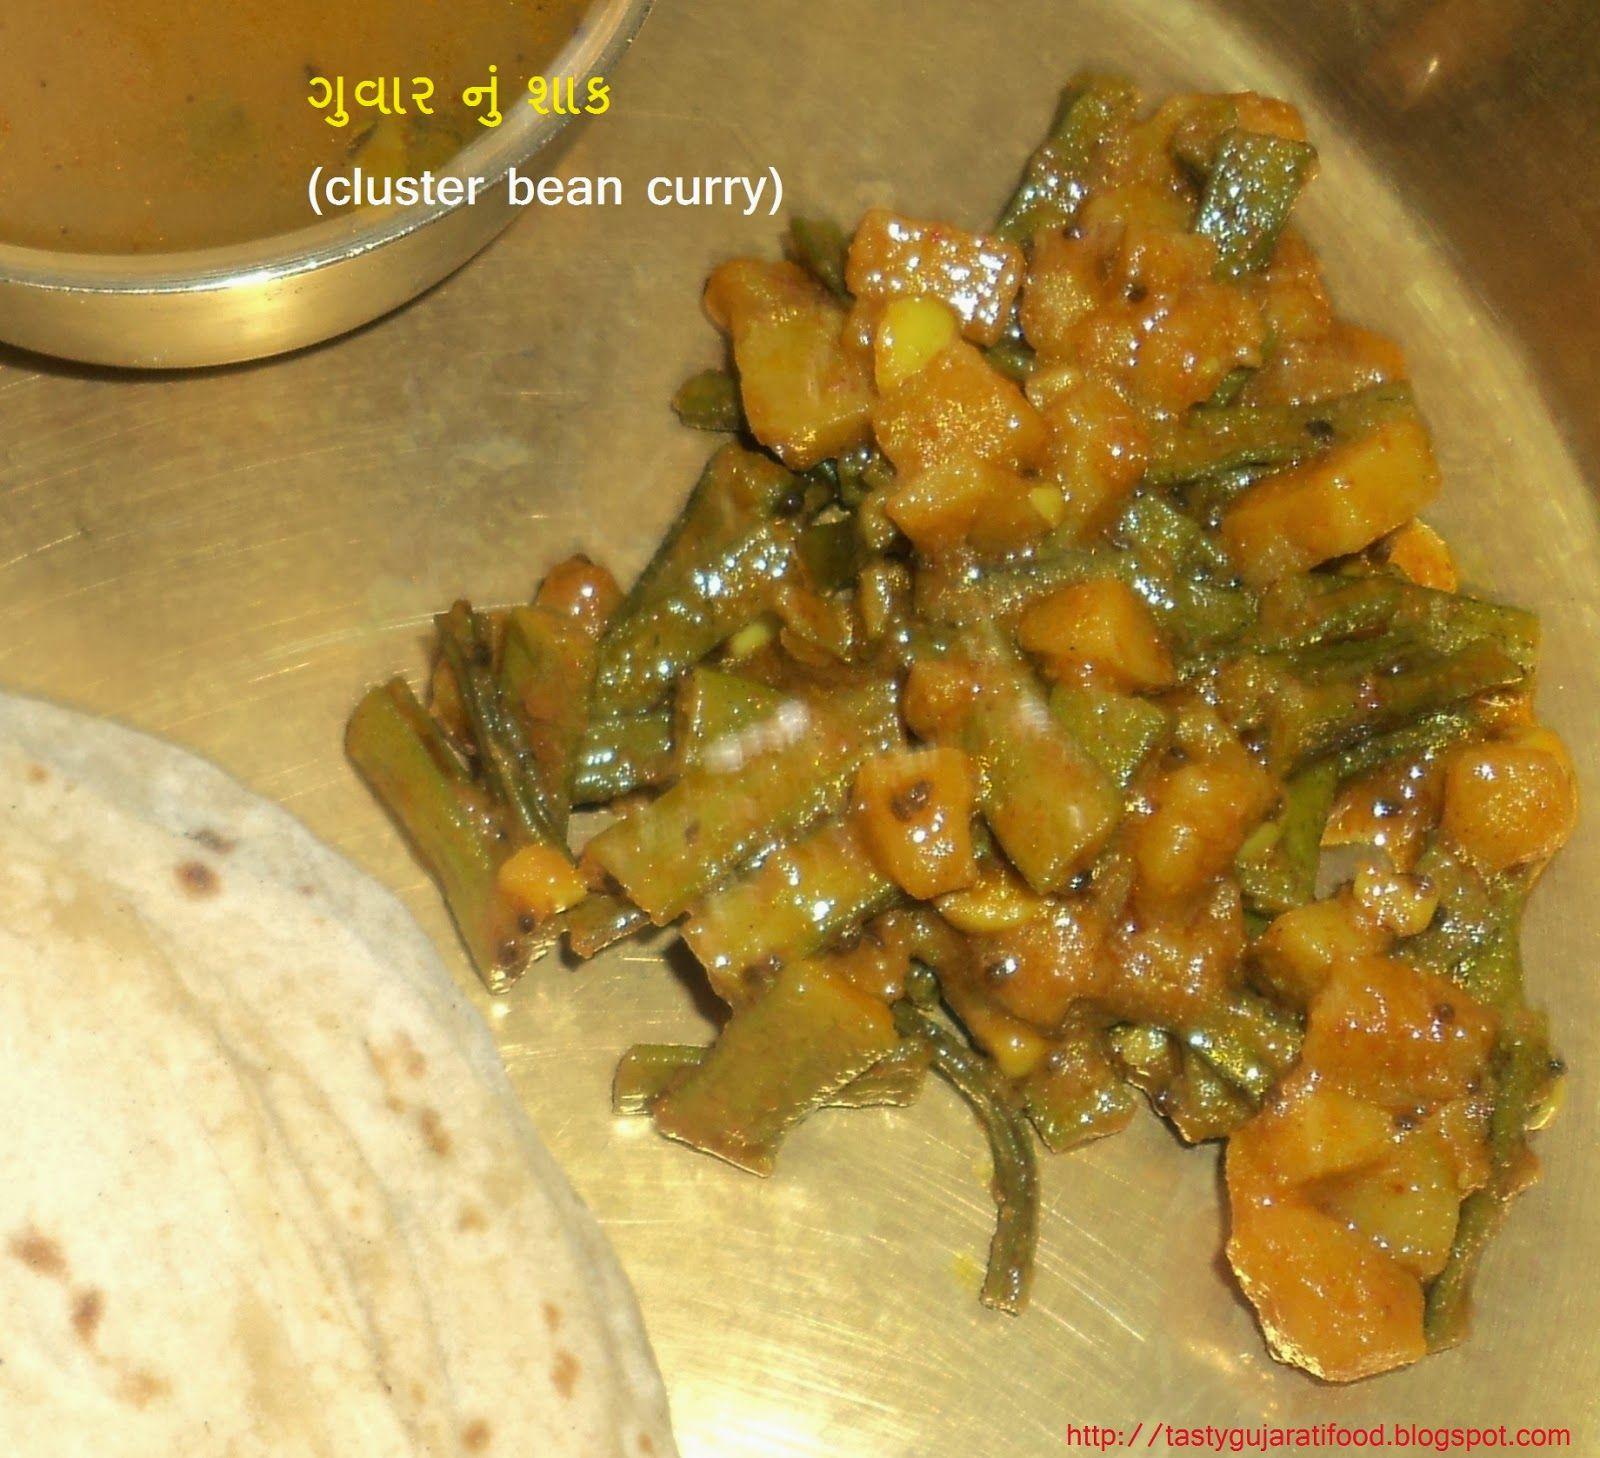 Delicious guvar bataka nu shaak recipe in gujarati language by delicious guvar bataka nu shaak recipe in gujarati language by tasty gujarati food blog forumfinder Images